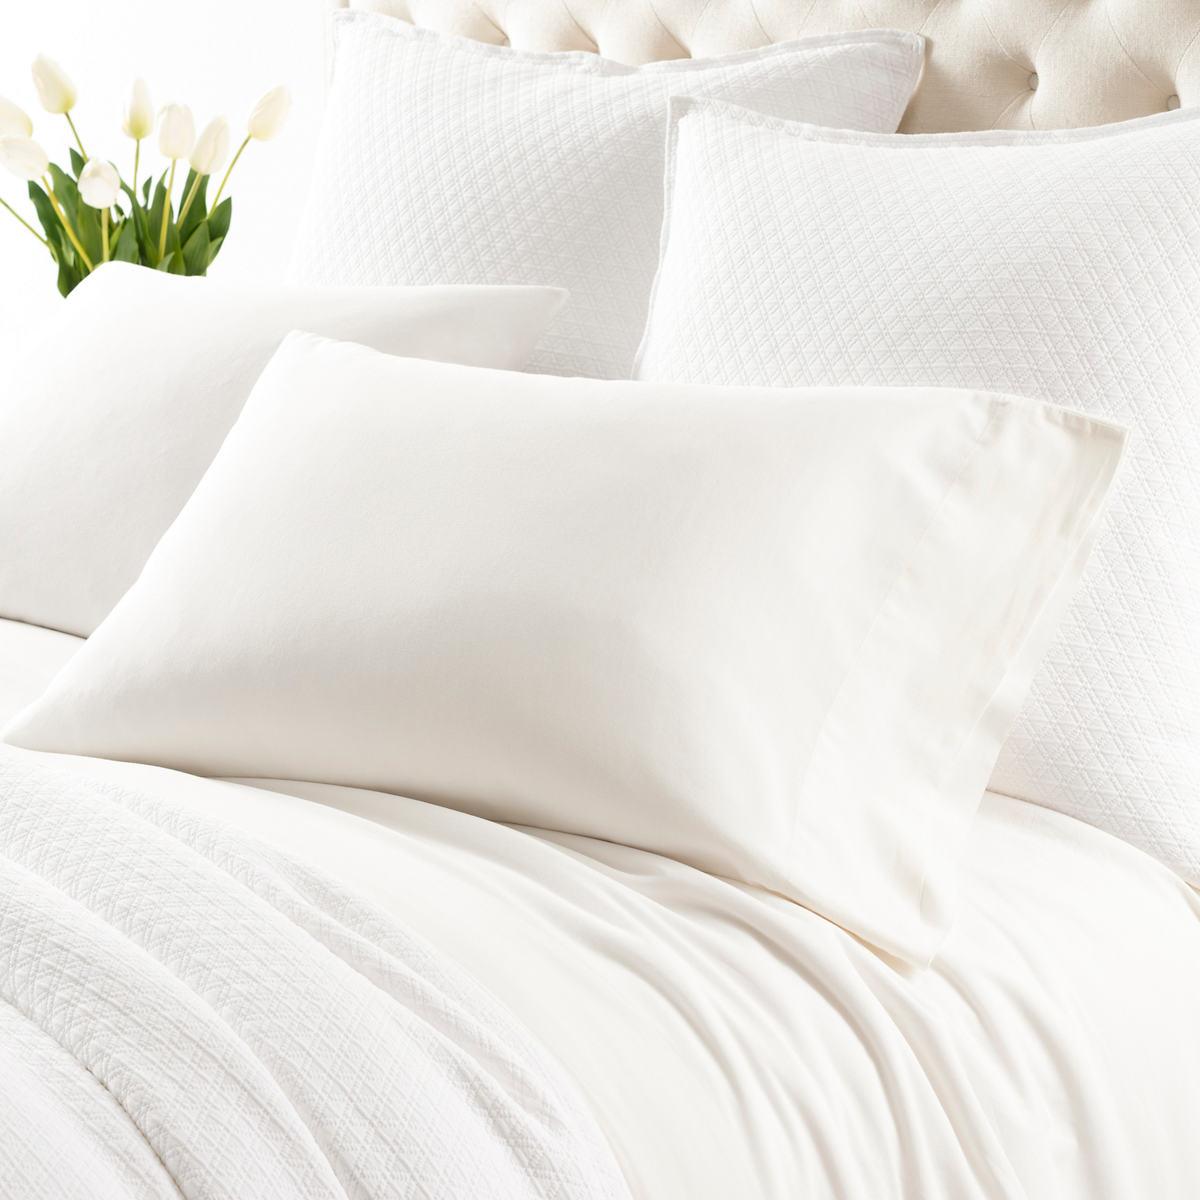 Comfy Cotton Dove White Sheet Set